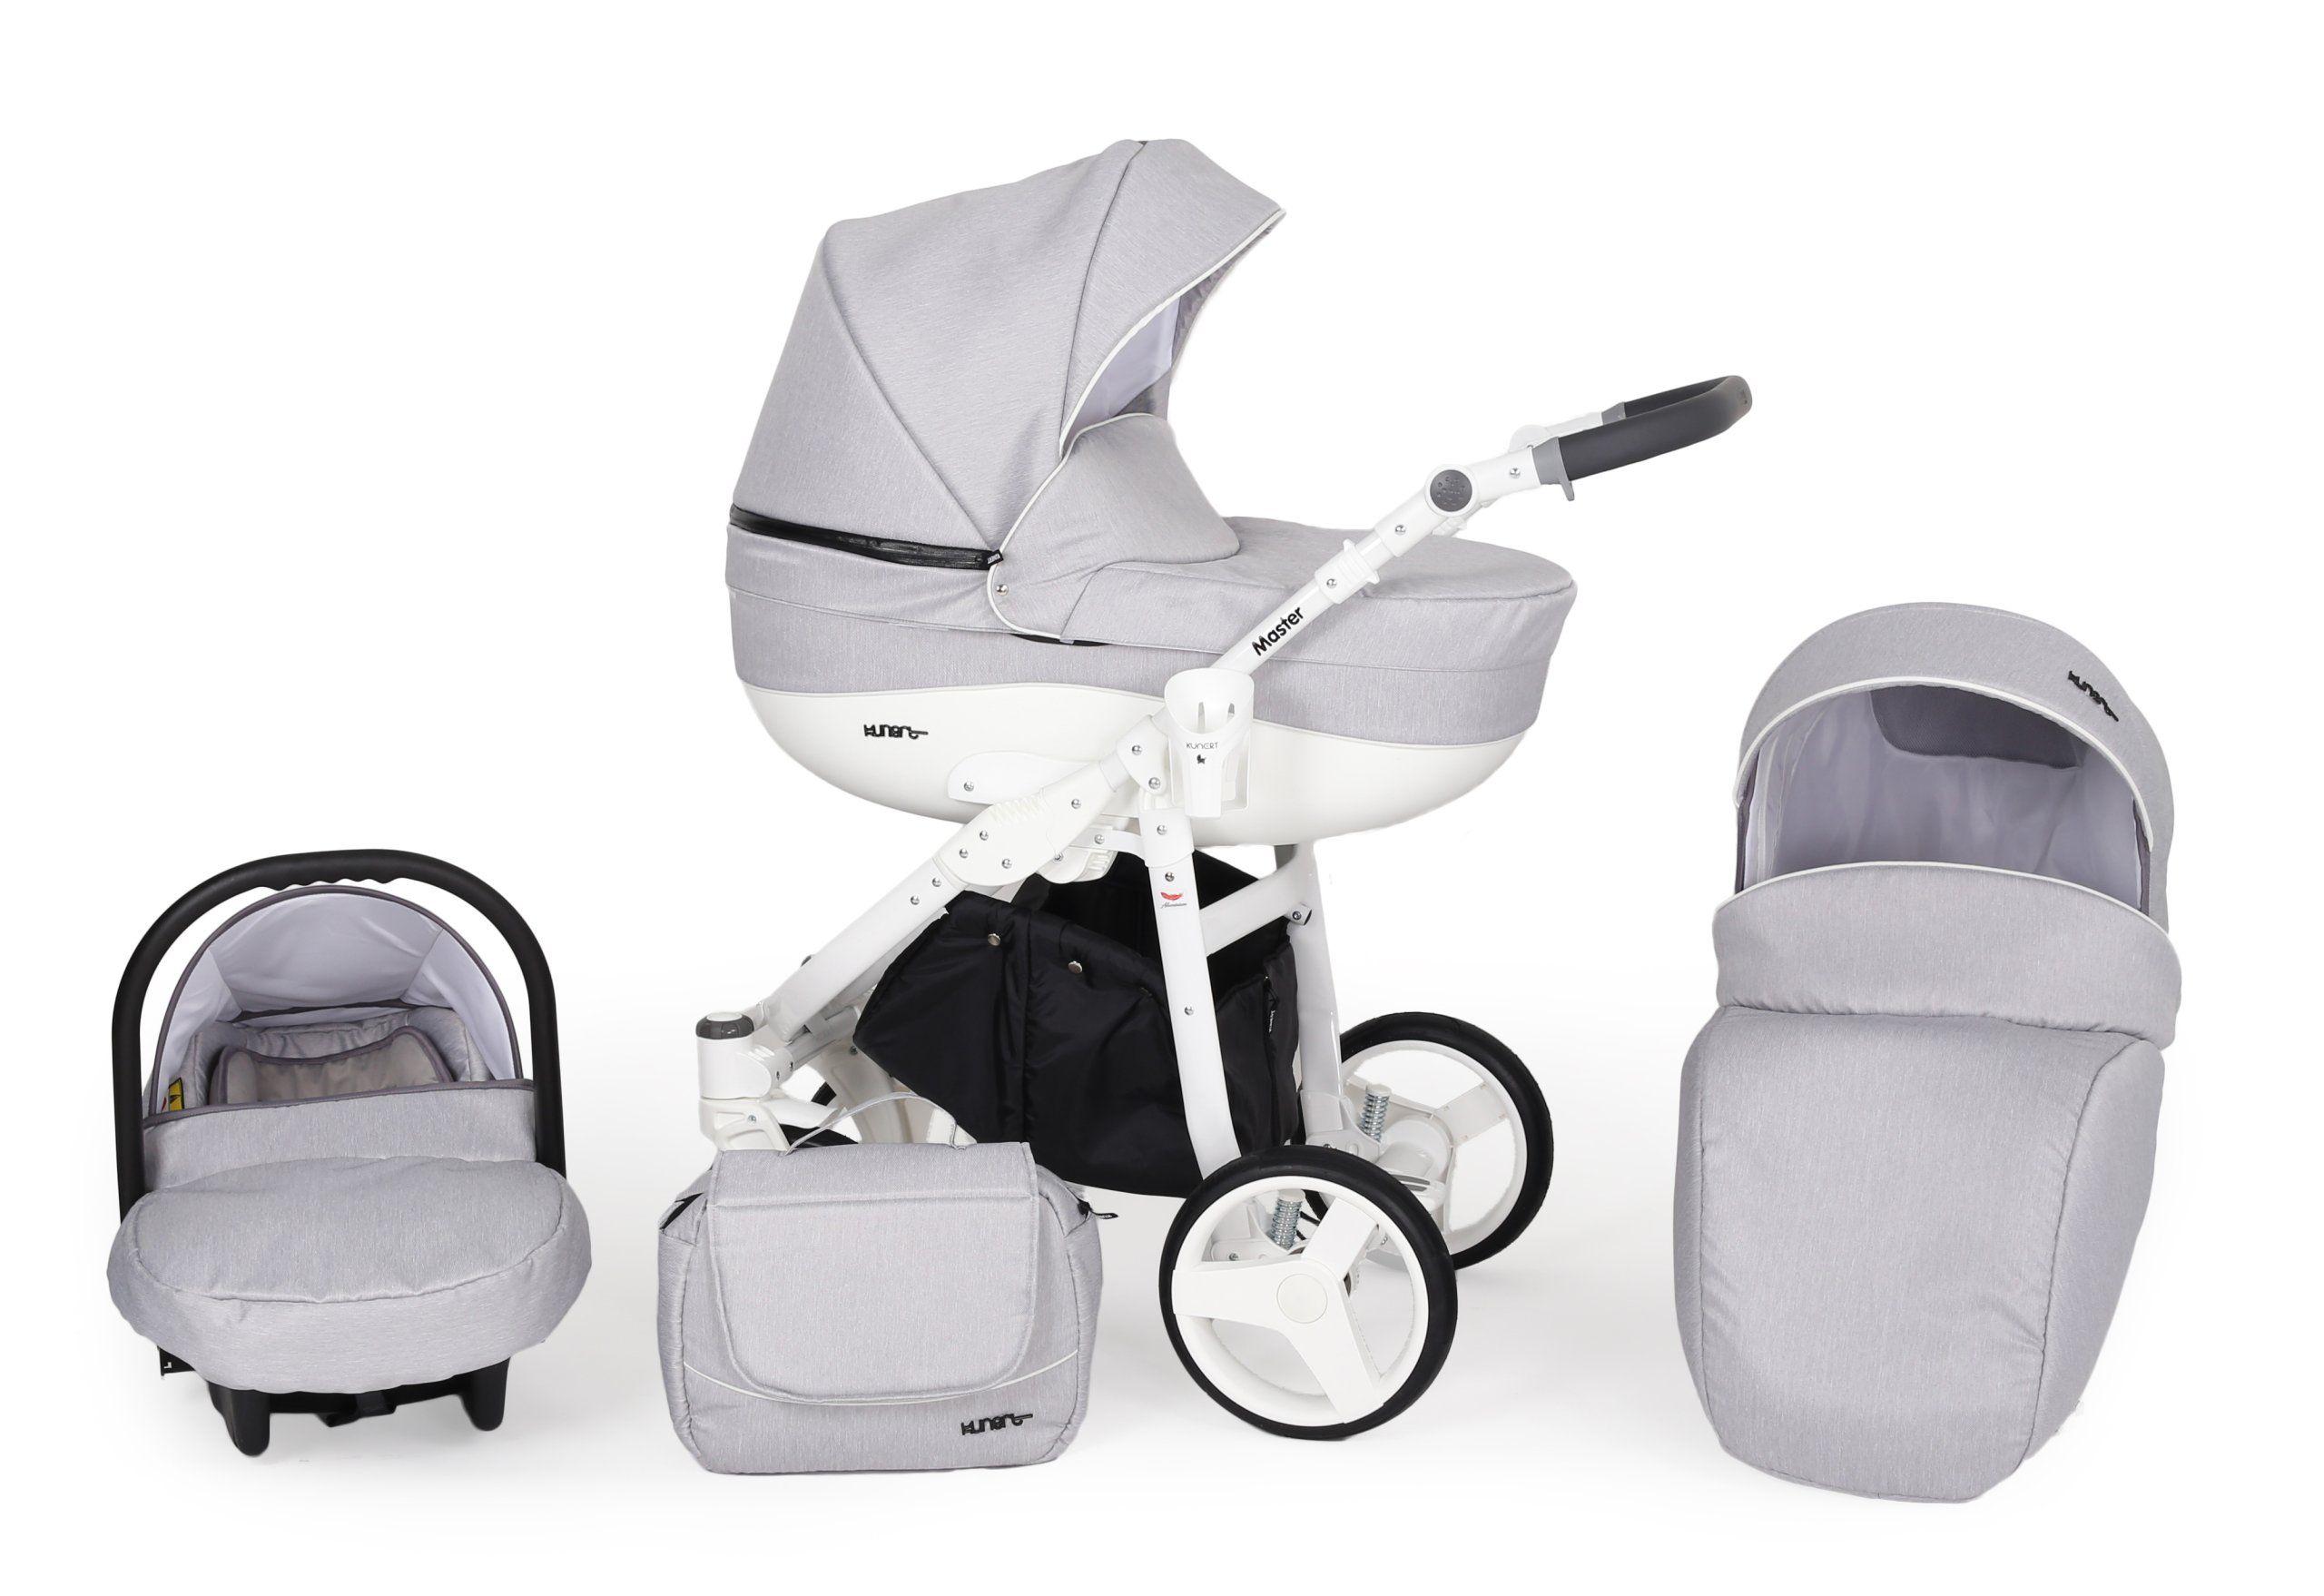 Kunert Wozek Dzieciecy Master 3w1 Ultra Lekki Baby Strollers Stroller Baby